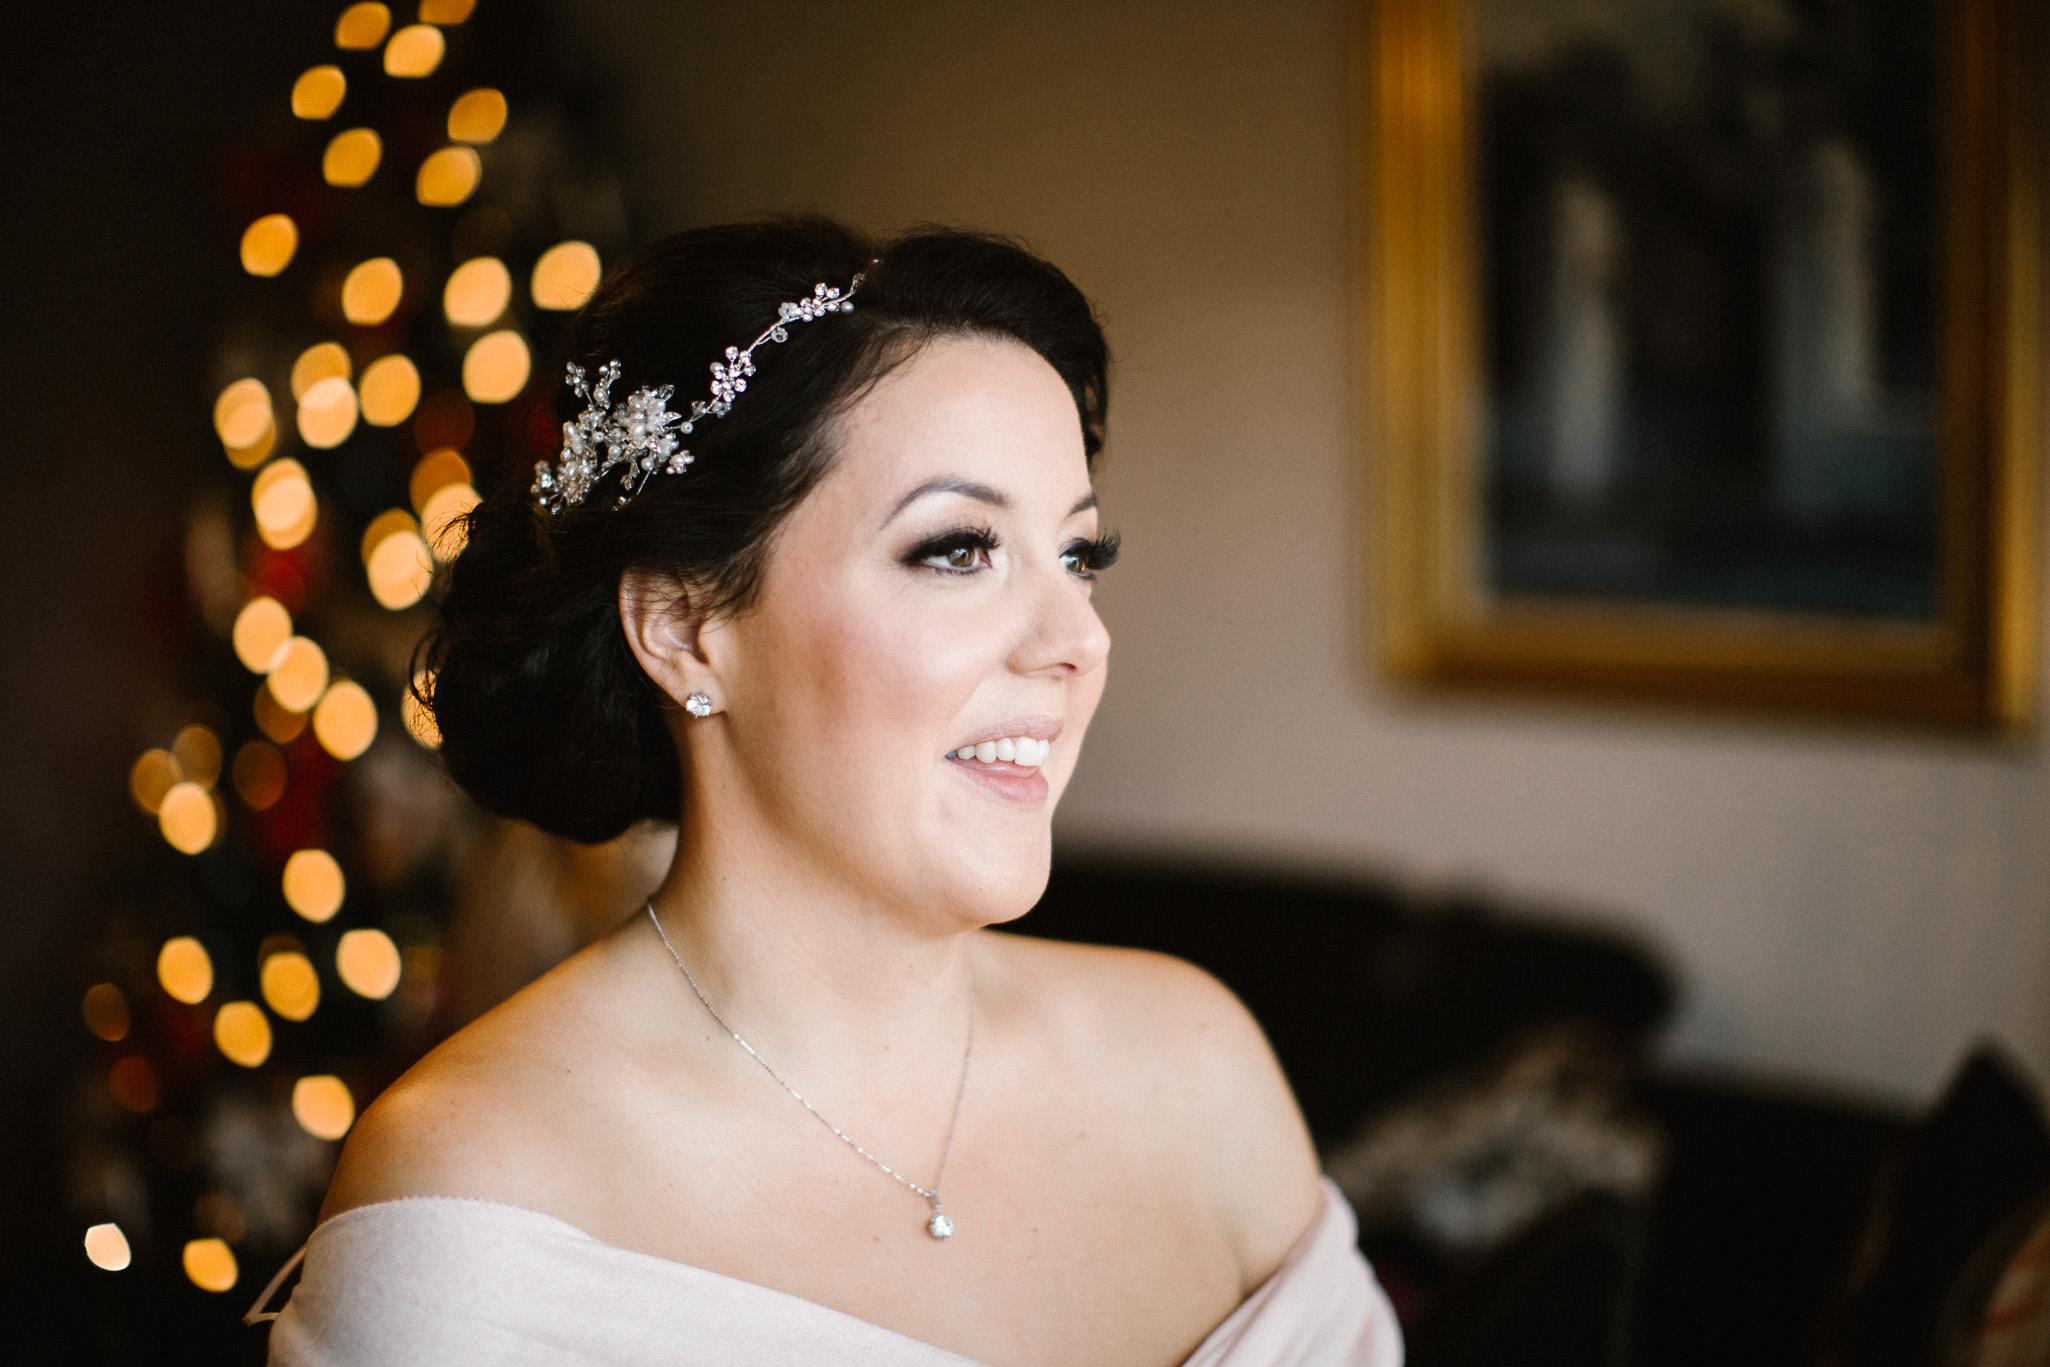 clairebyrnephotography-wedding-sparklers-christmas-orlagh-daithi-2.jpg